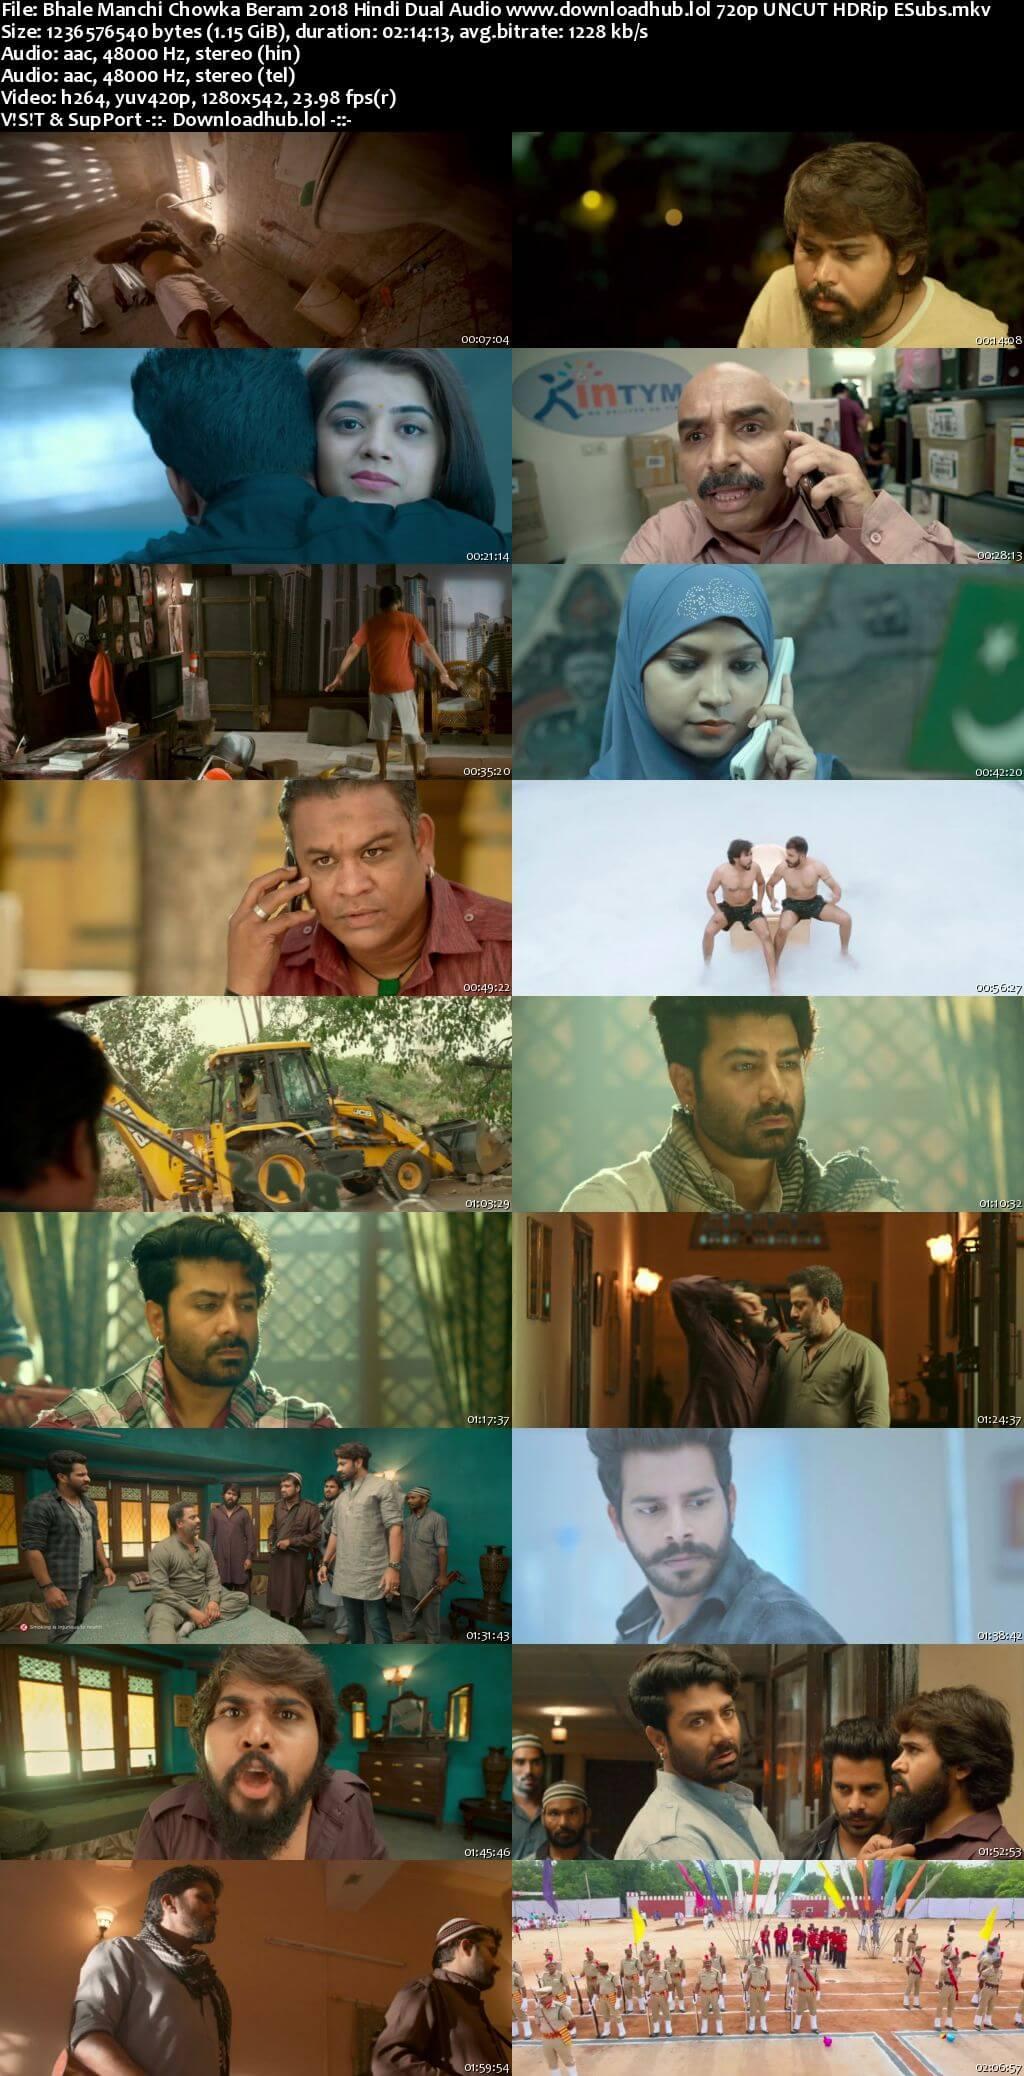 Bhale Manchi Chowka Beram 2018 Hindi Dual Audio 720p UNCUT HDRip ESubs